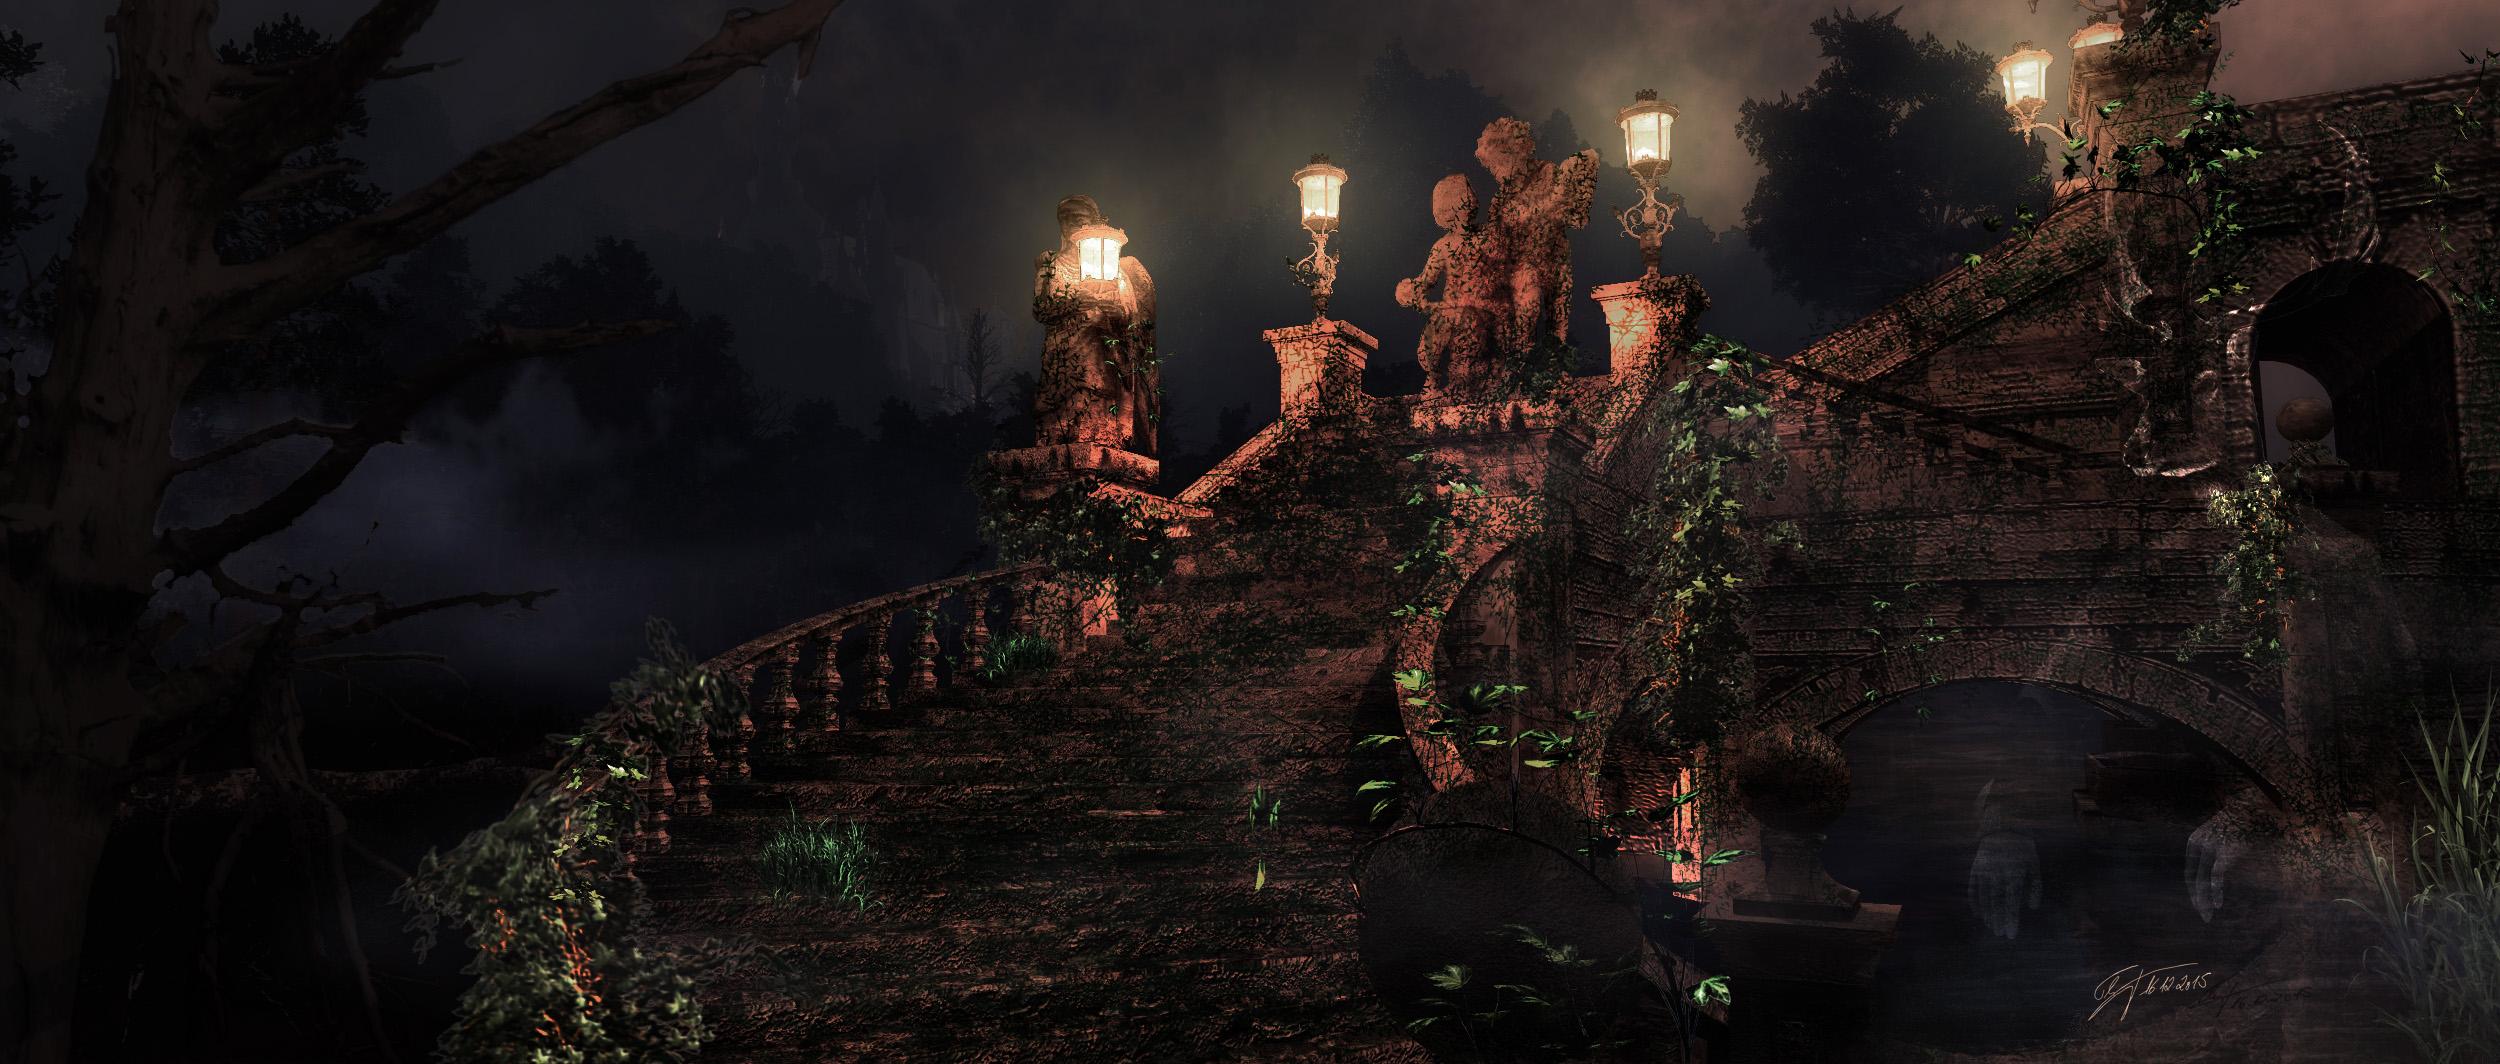 MWD 69; Contest; Bridge; Statue; Night; Light;